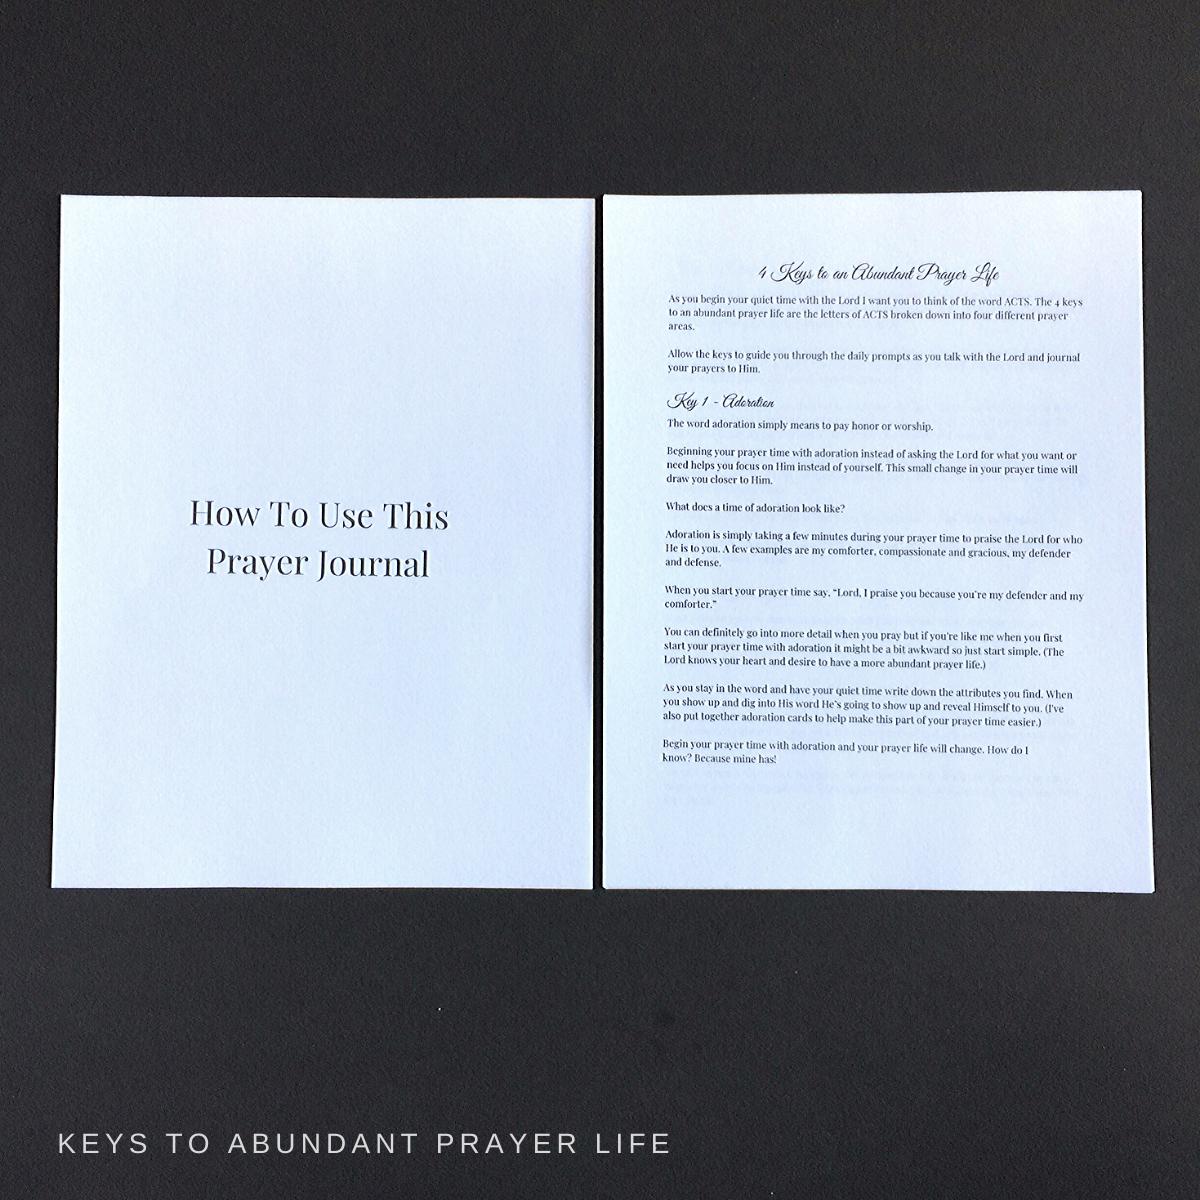 4 keys to an abundant prayer life